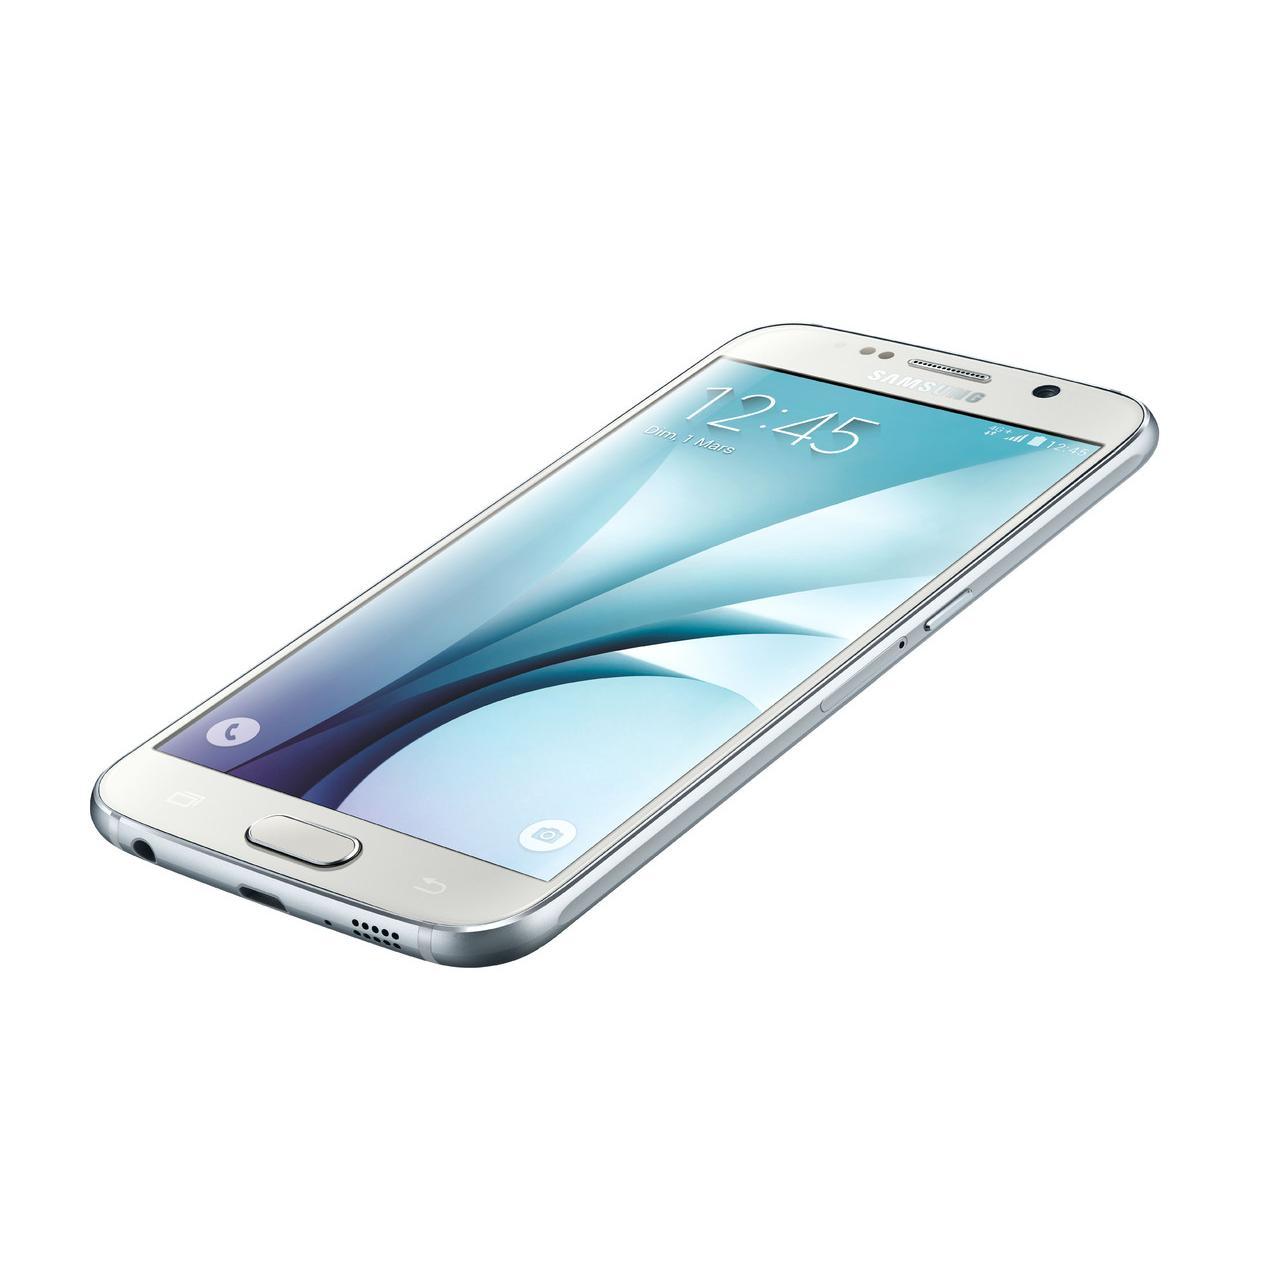 Galaxy S6 64 Go - Blanc - Débloqué